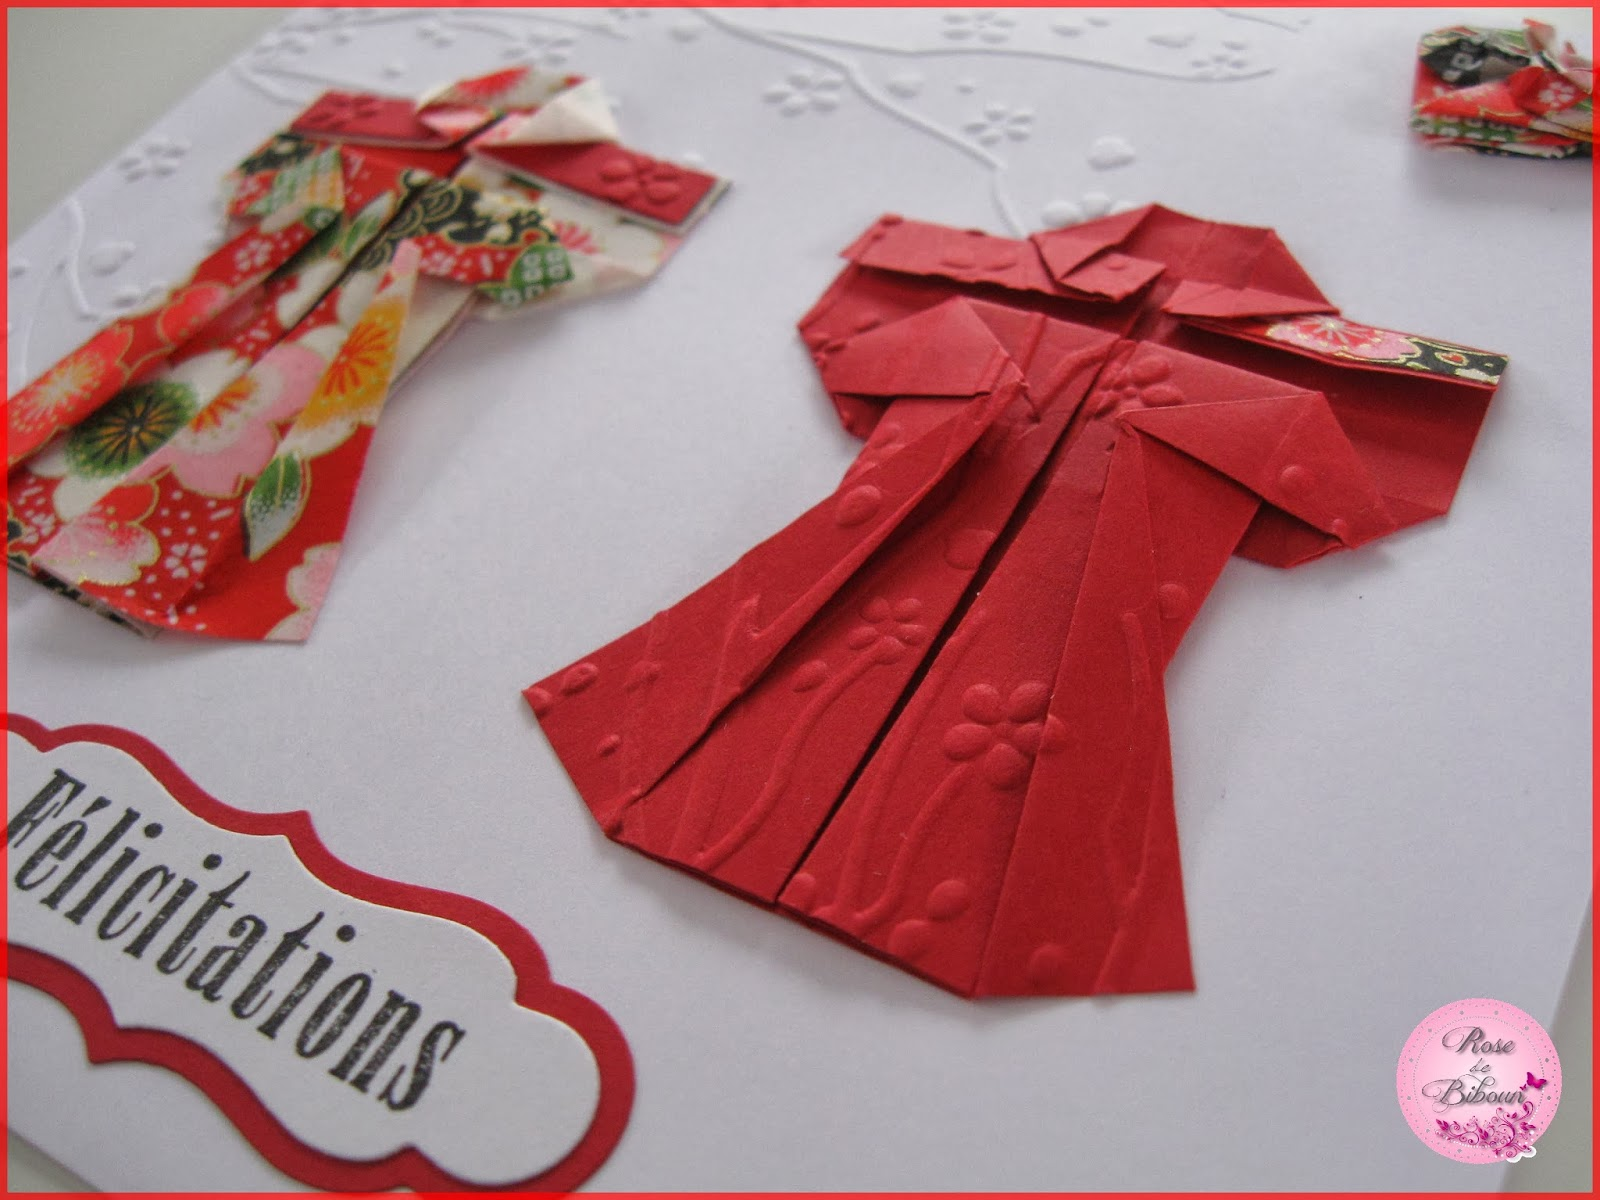 rose de biboun carte de f licitations mariage origami. Black Bedroom Furniture Sets. Home Design Ideas